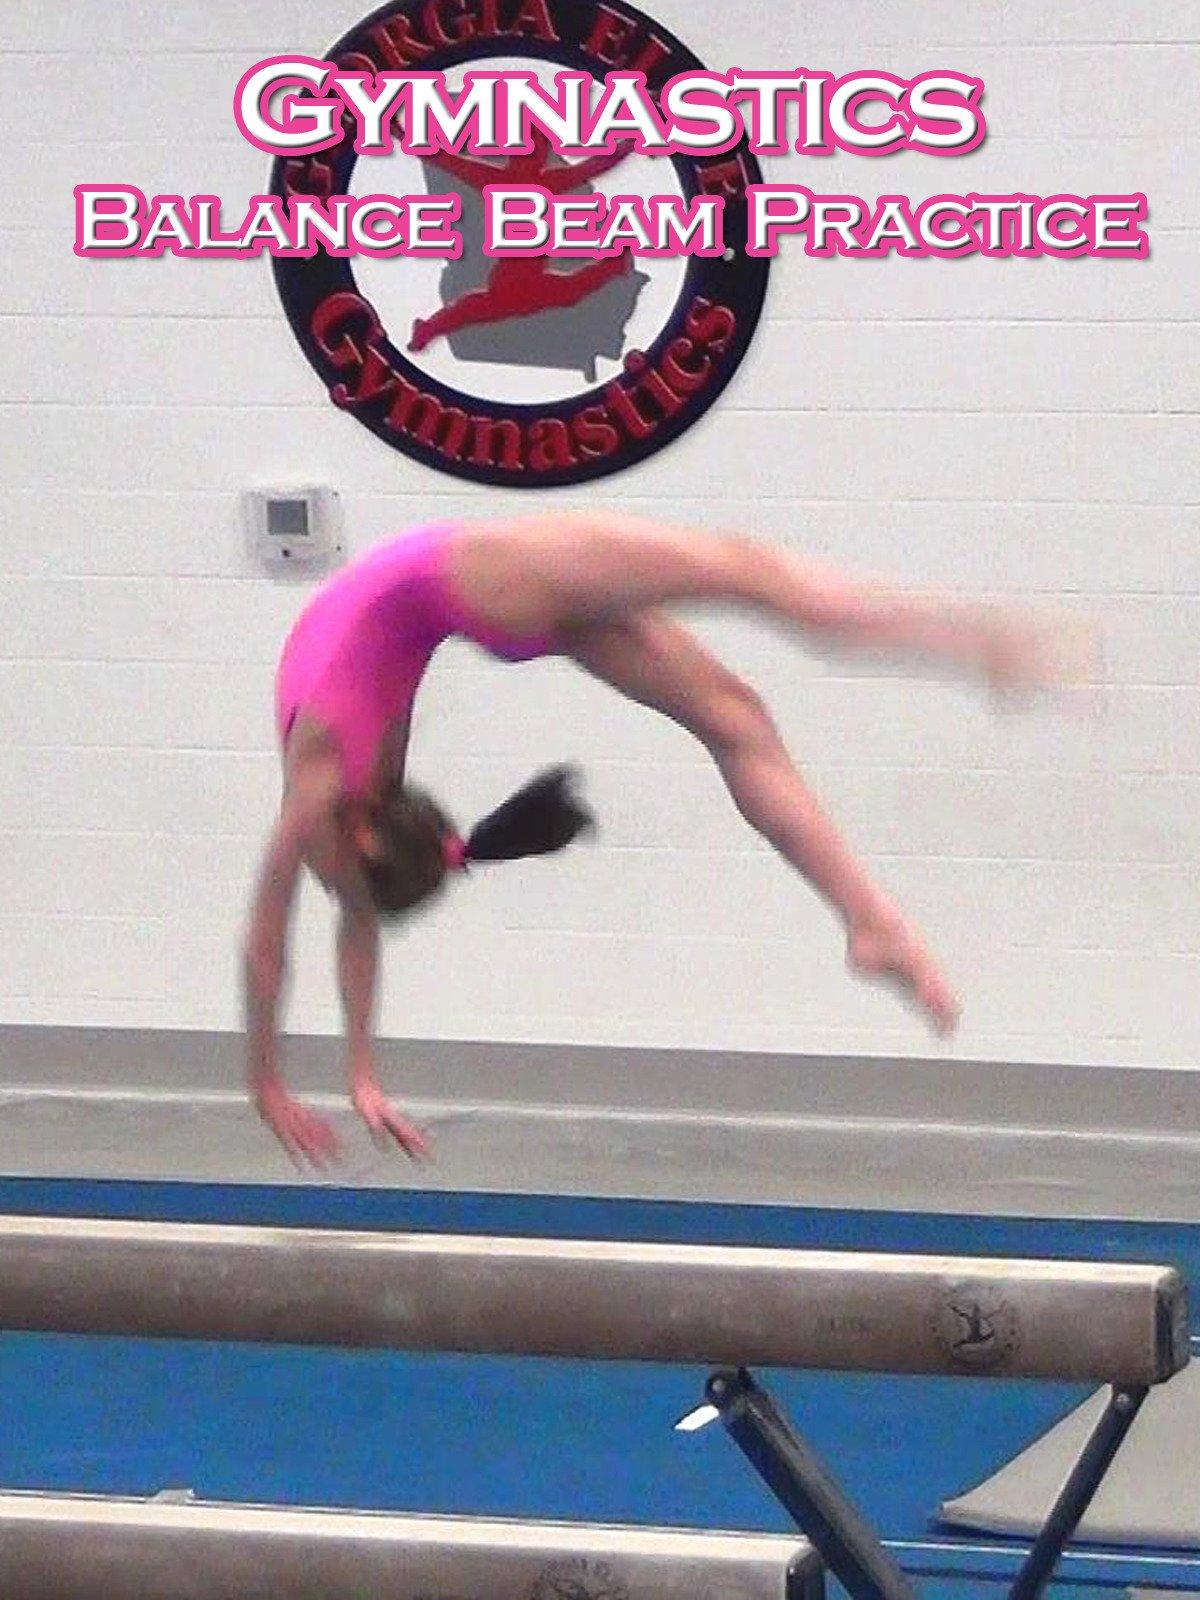 Gymnastics Balance Beam Practice on Amazon Prime Video UK